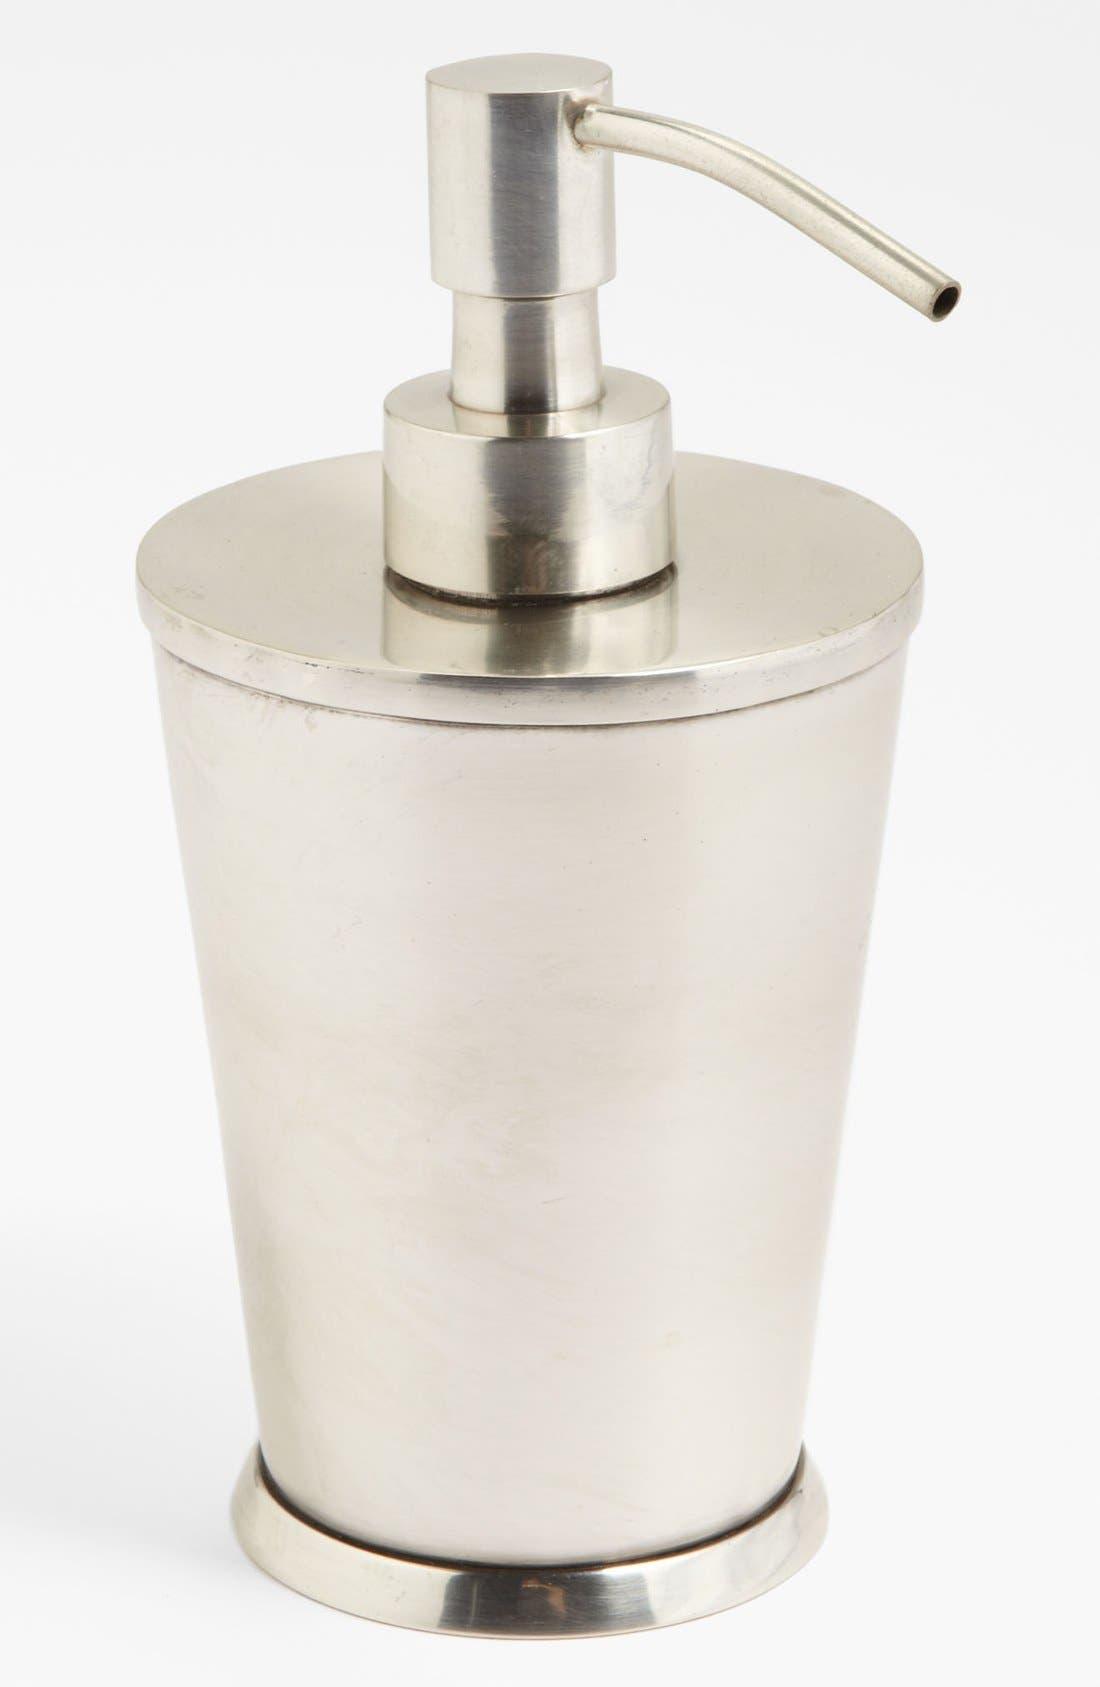 Alternate Image 1 Selected - Waterworks Studio 'Wallingford' Soap Dispenser (Online Only)